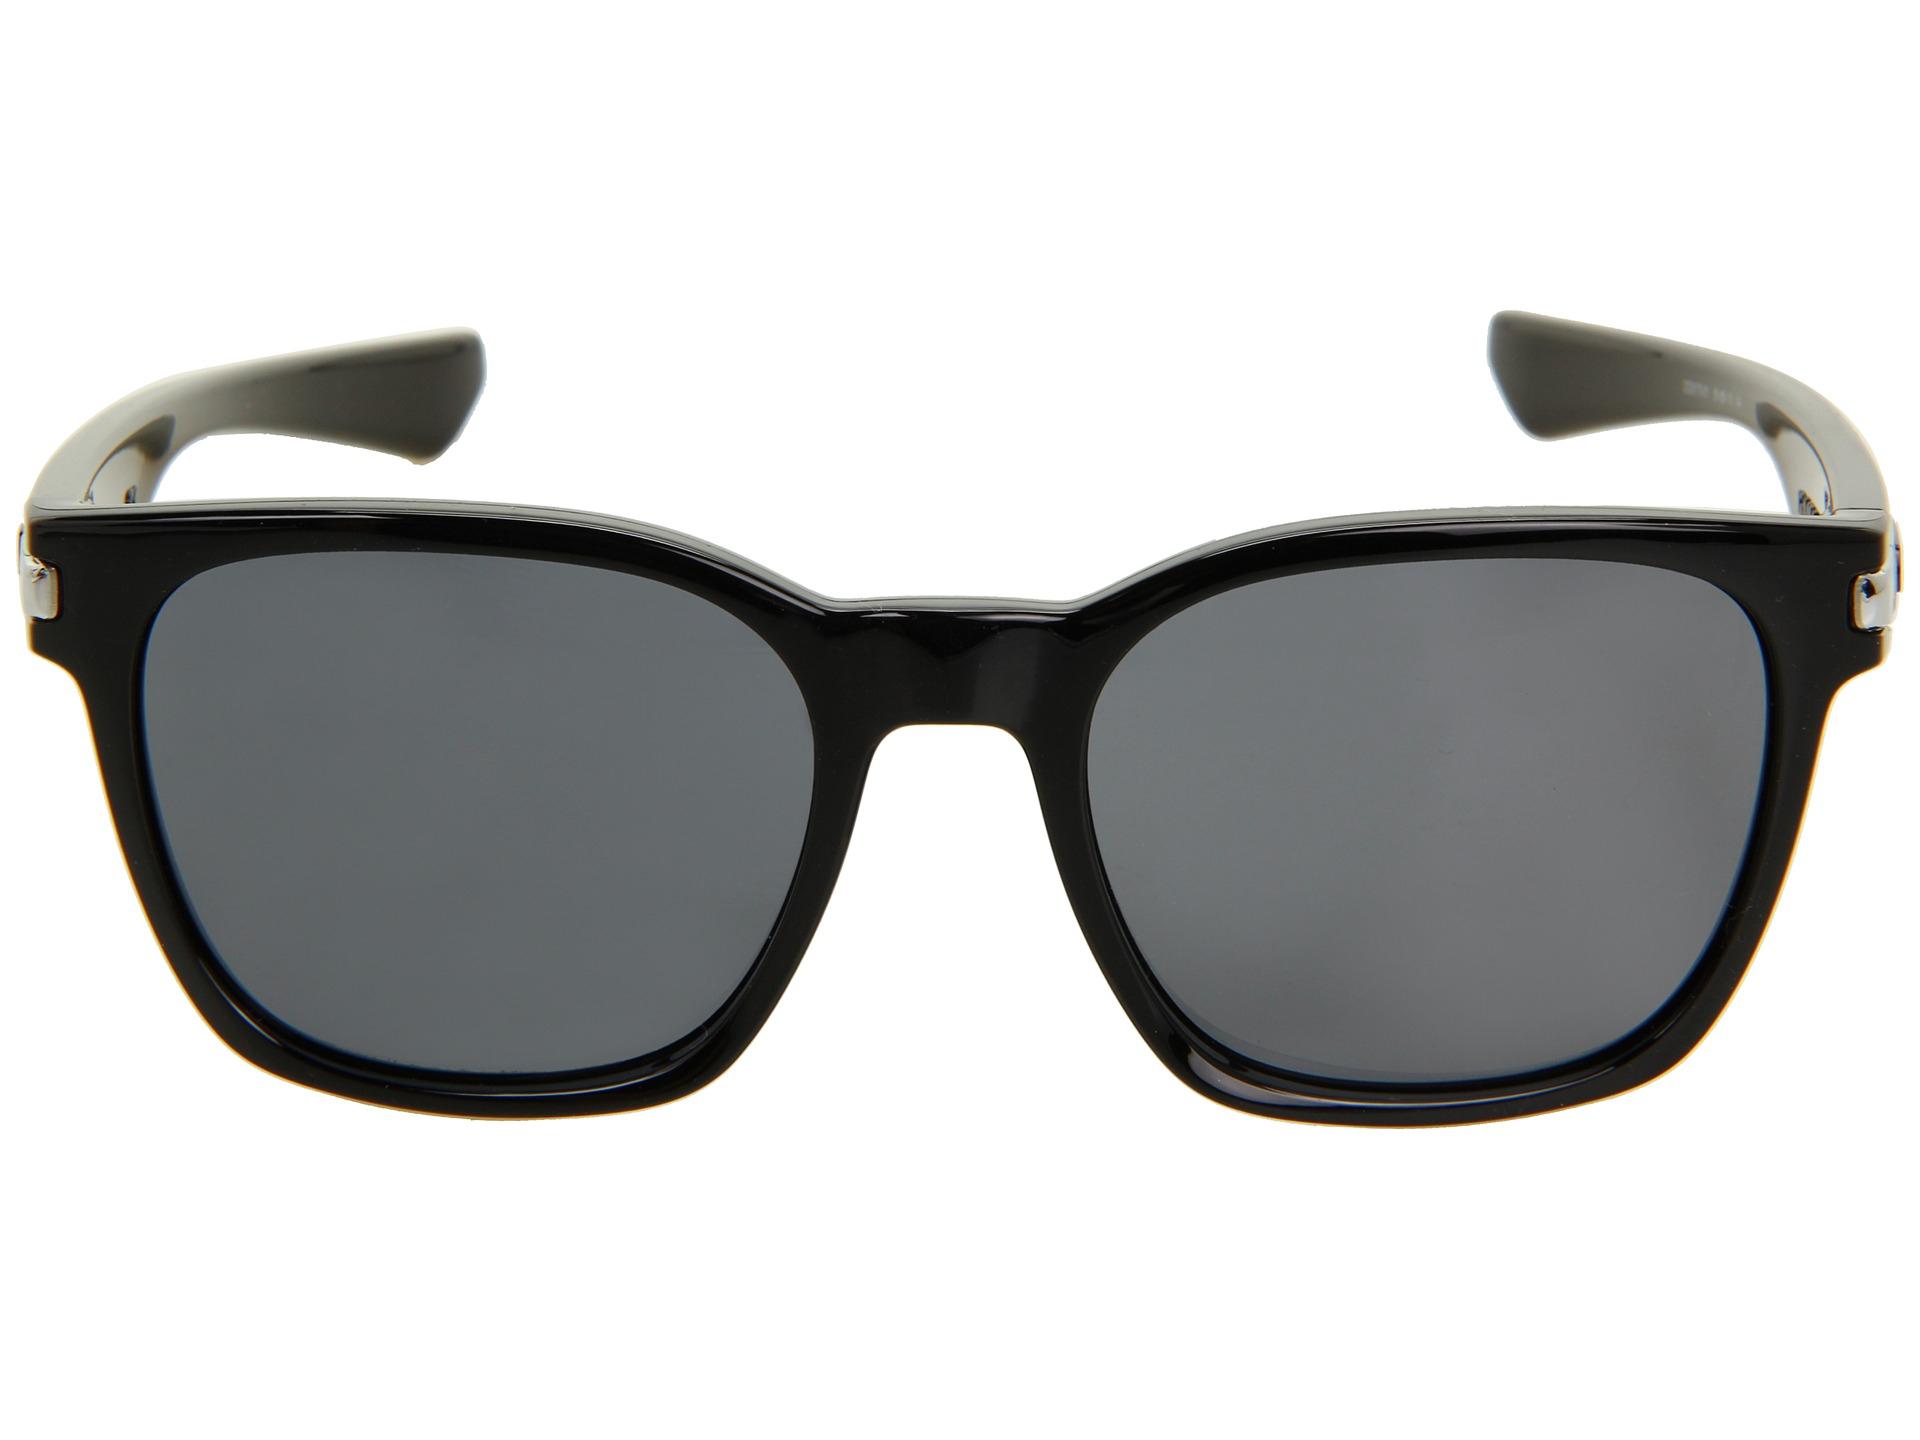 Sunglasses Oakley Moto... Oakley Garage Rock Vs Holbrook